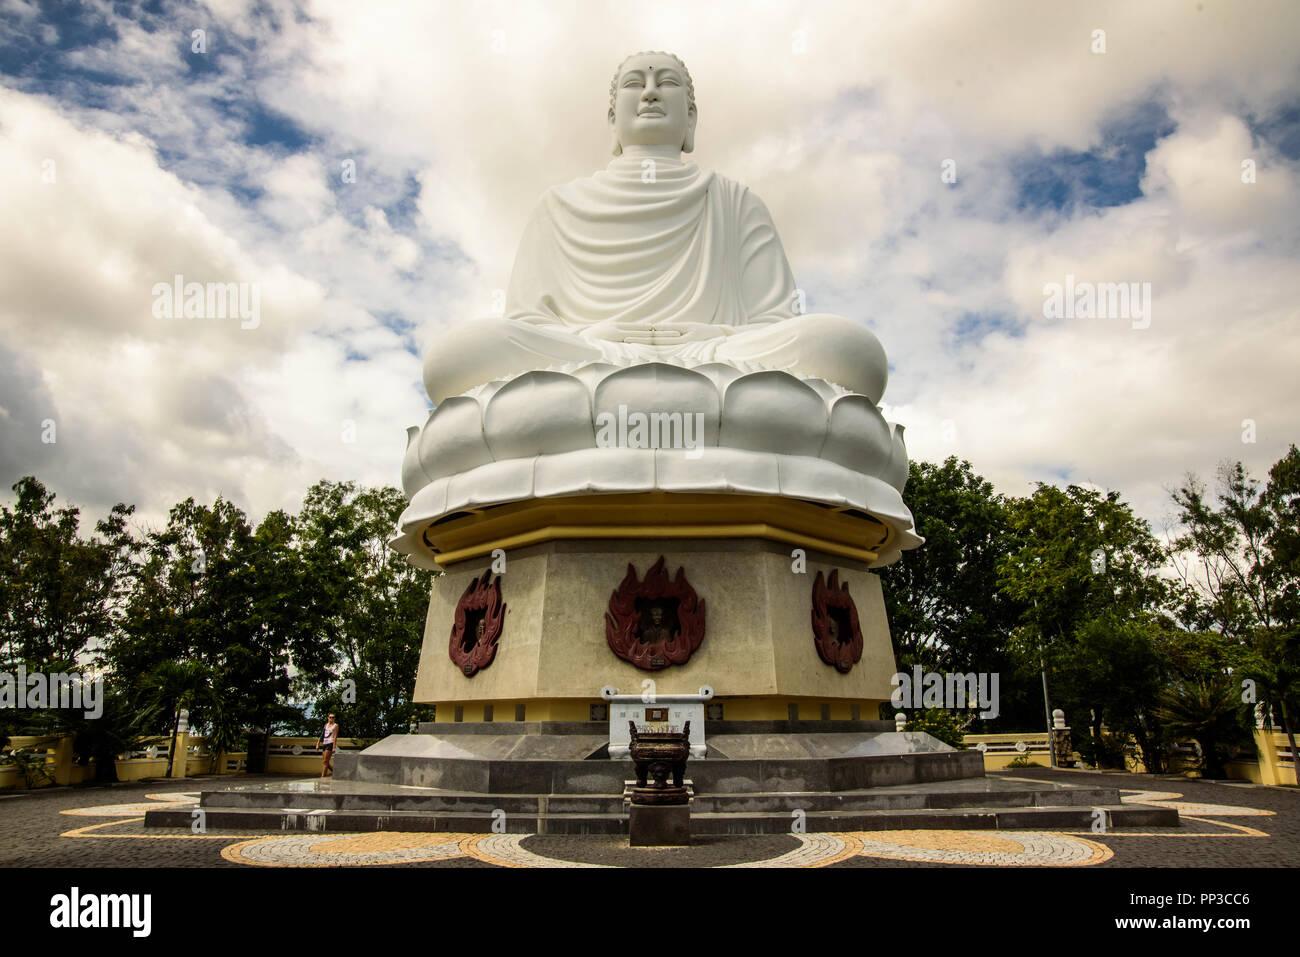 Vietnam, Nha Trang - January 3, 2016: Statue of Big Buddha in Long Son Pagoda Stock Photo